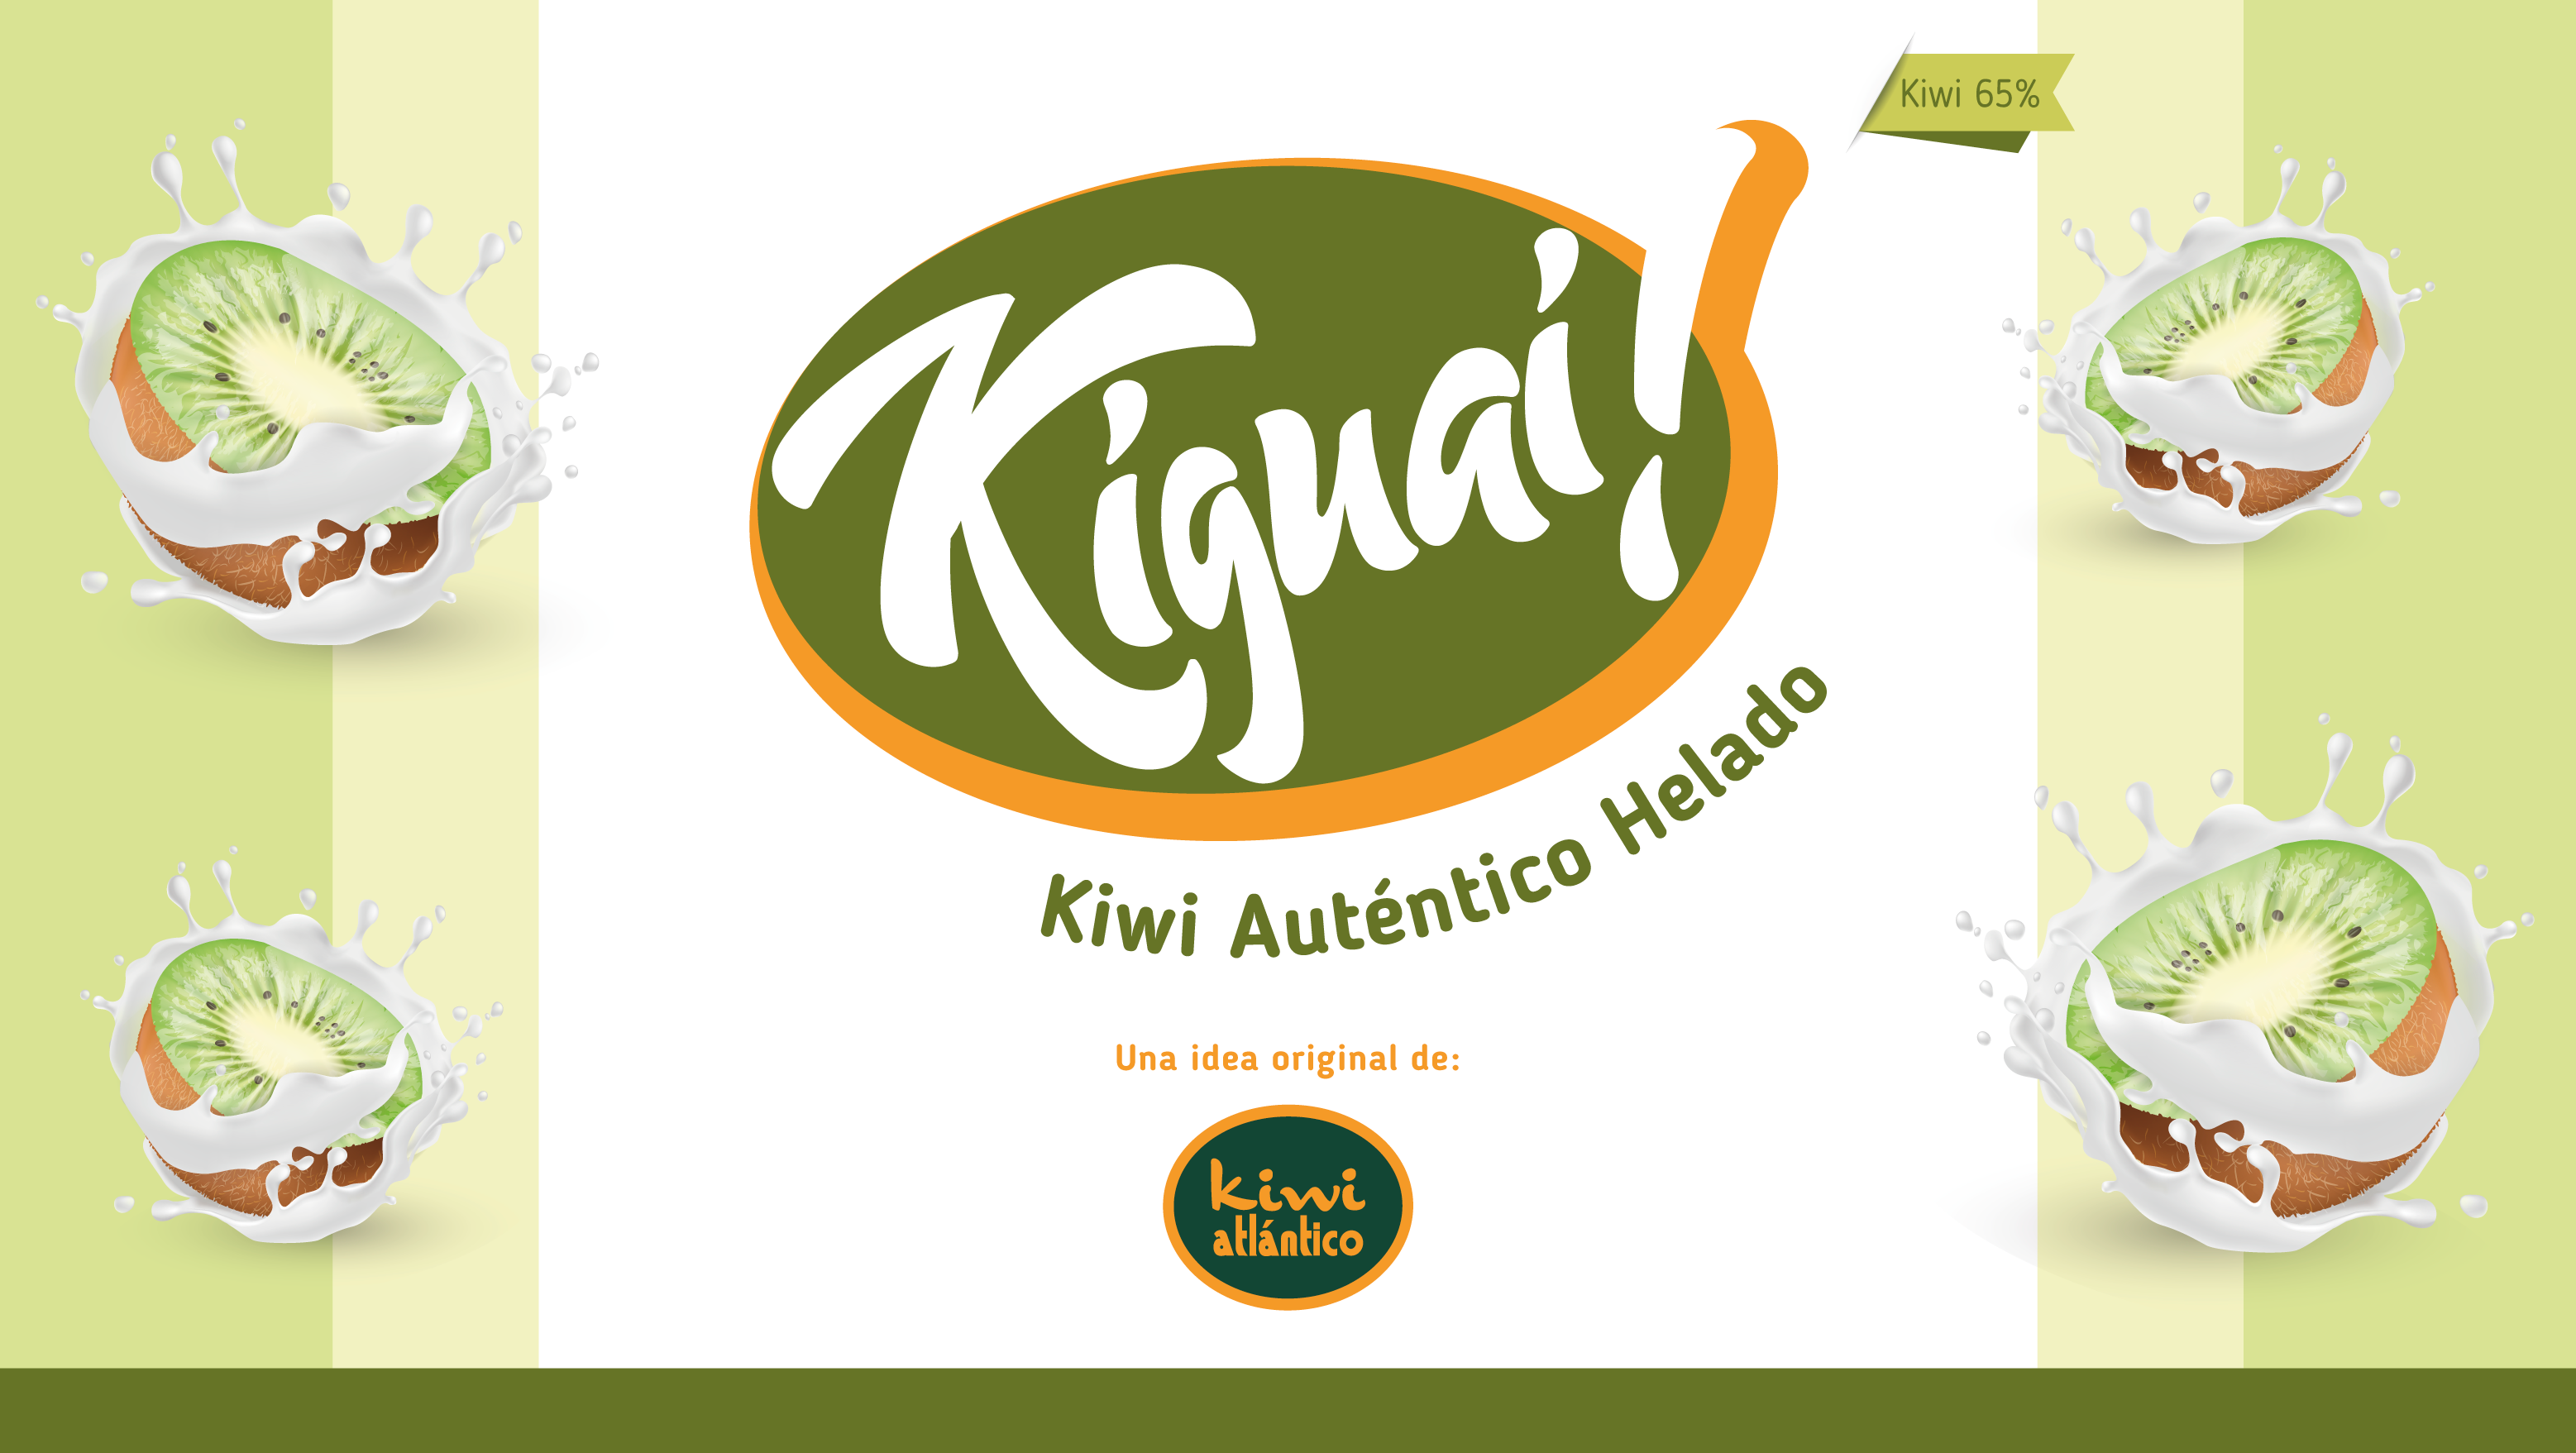 Helado de kiwi